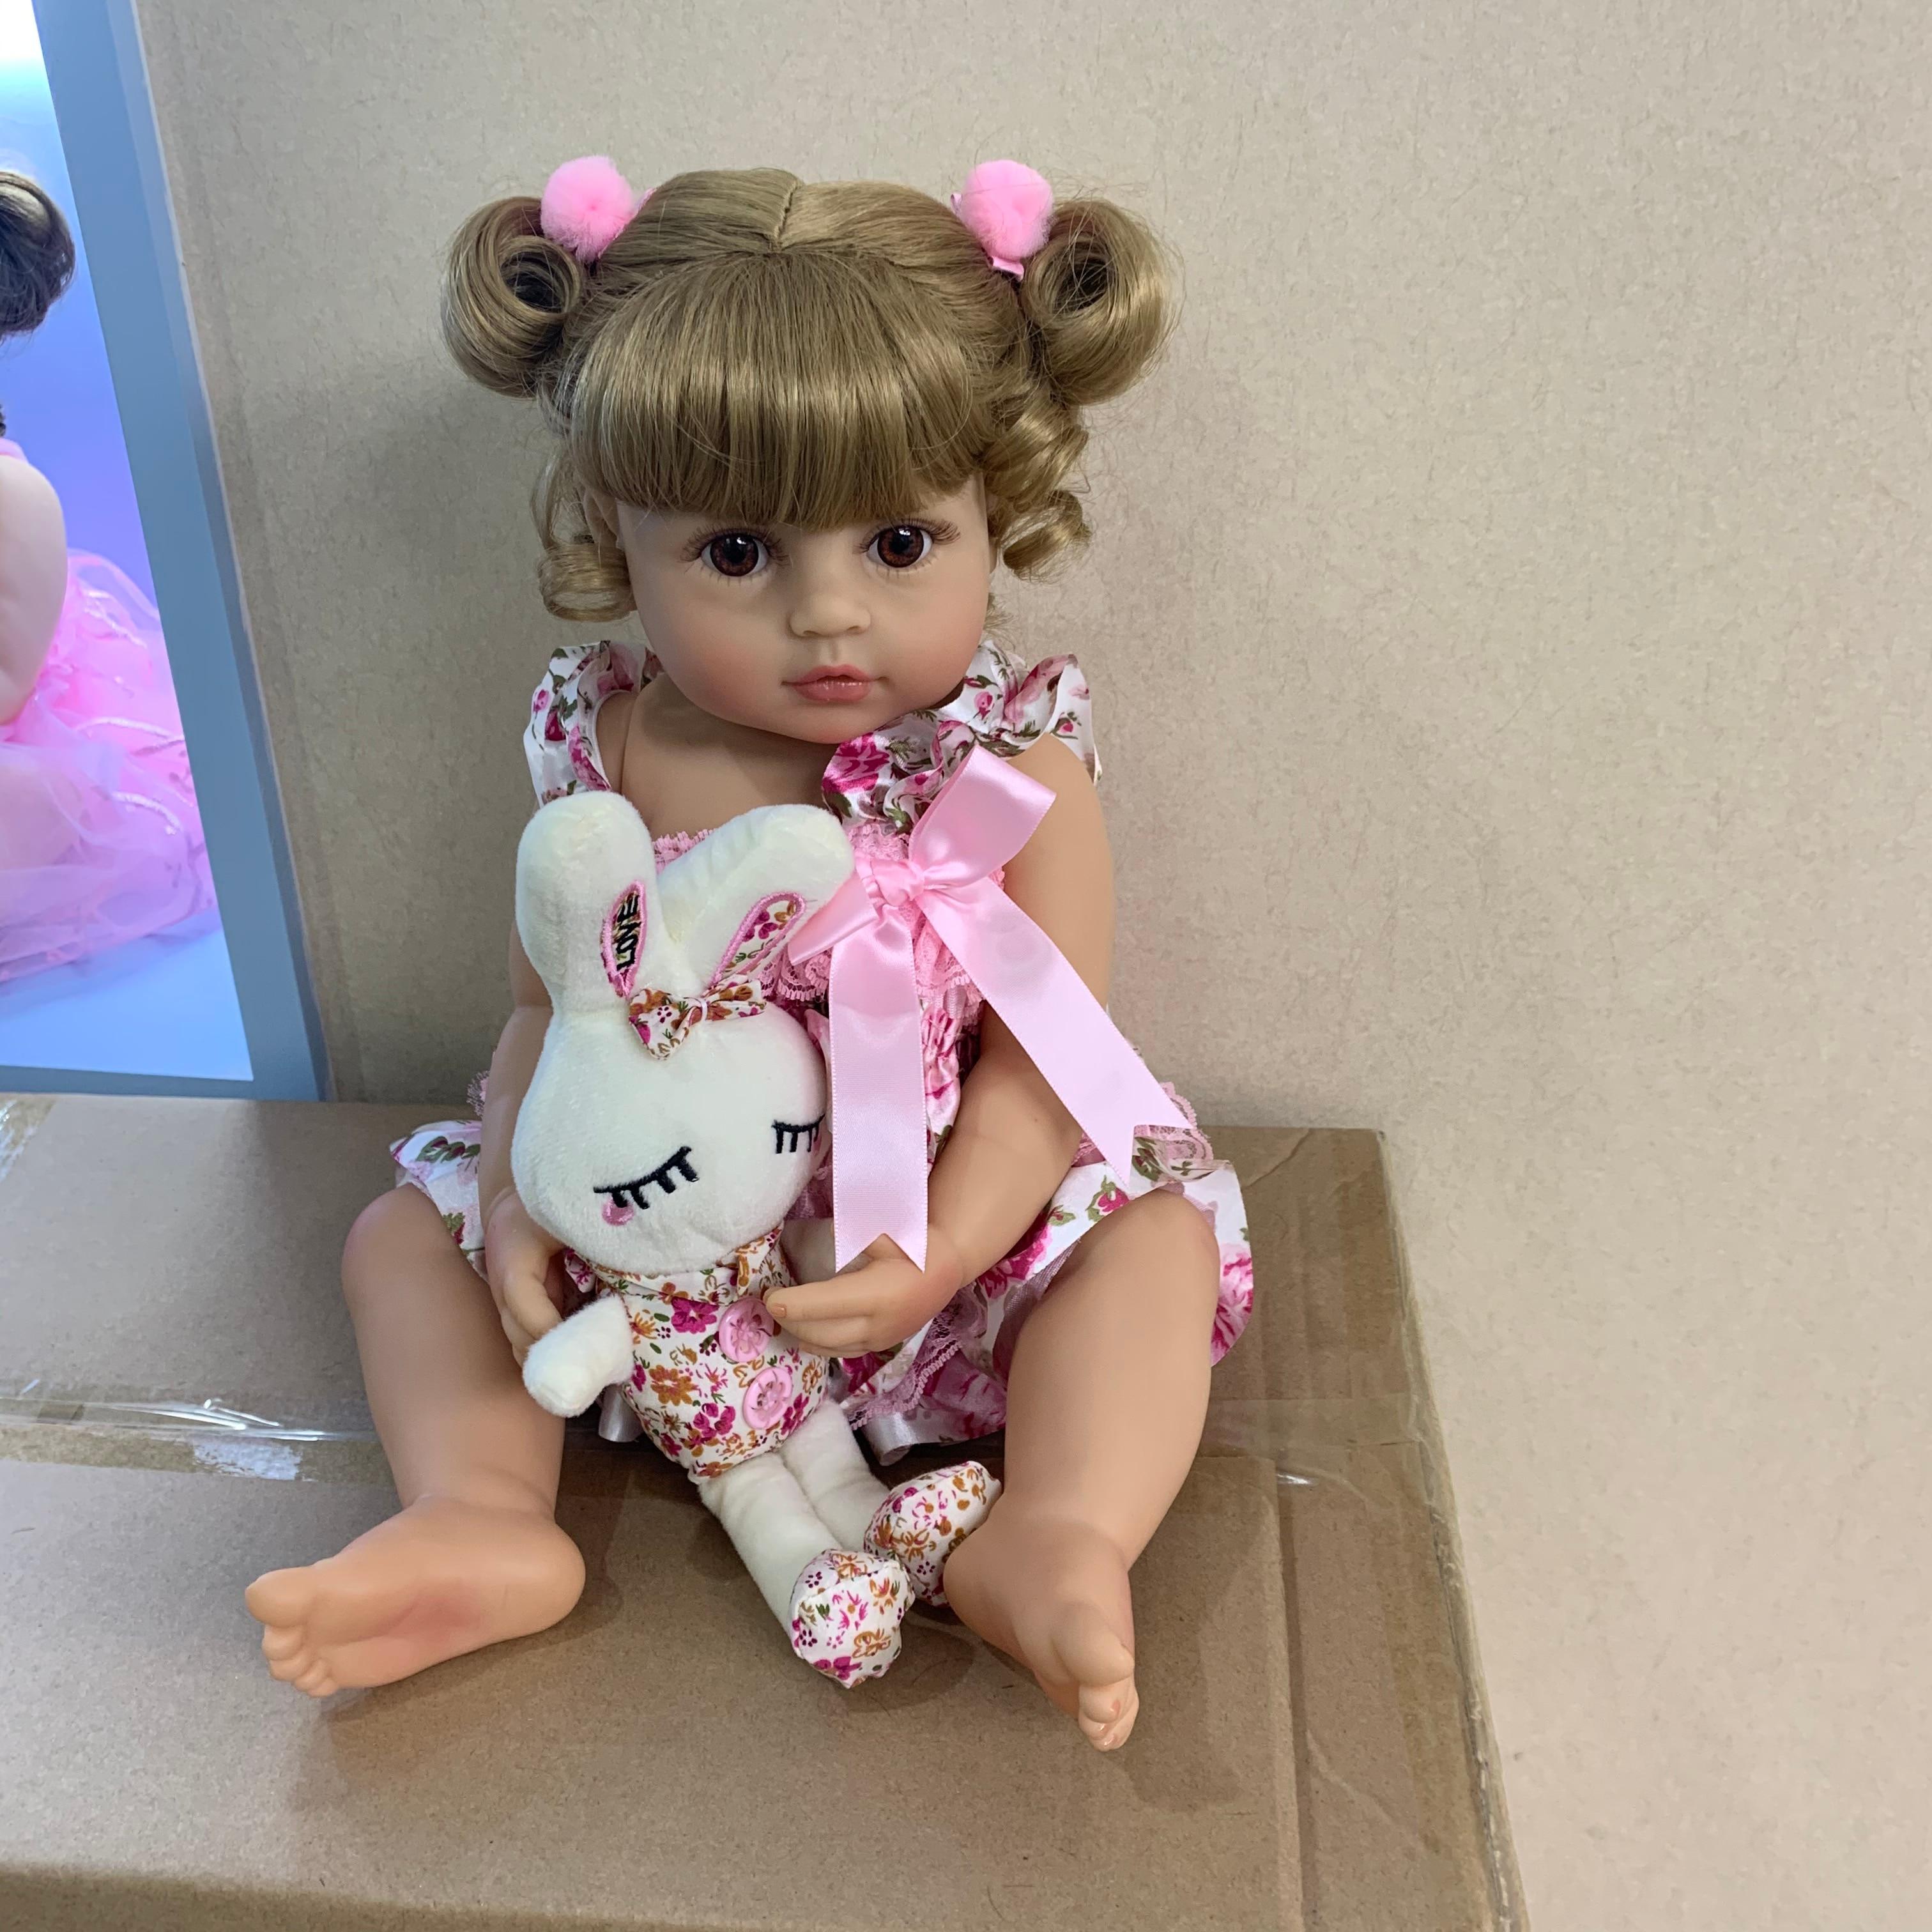 55CM original NPK reborn baby toddler girl princess doll in pink skirt lifelike very soft full body silicone doll bath toy gift(China)